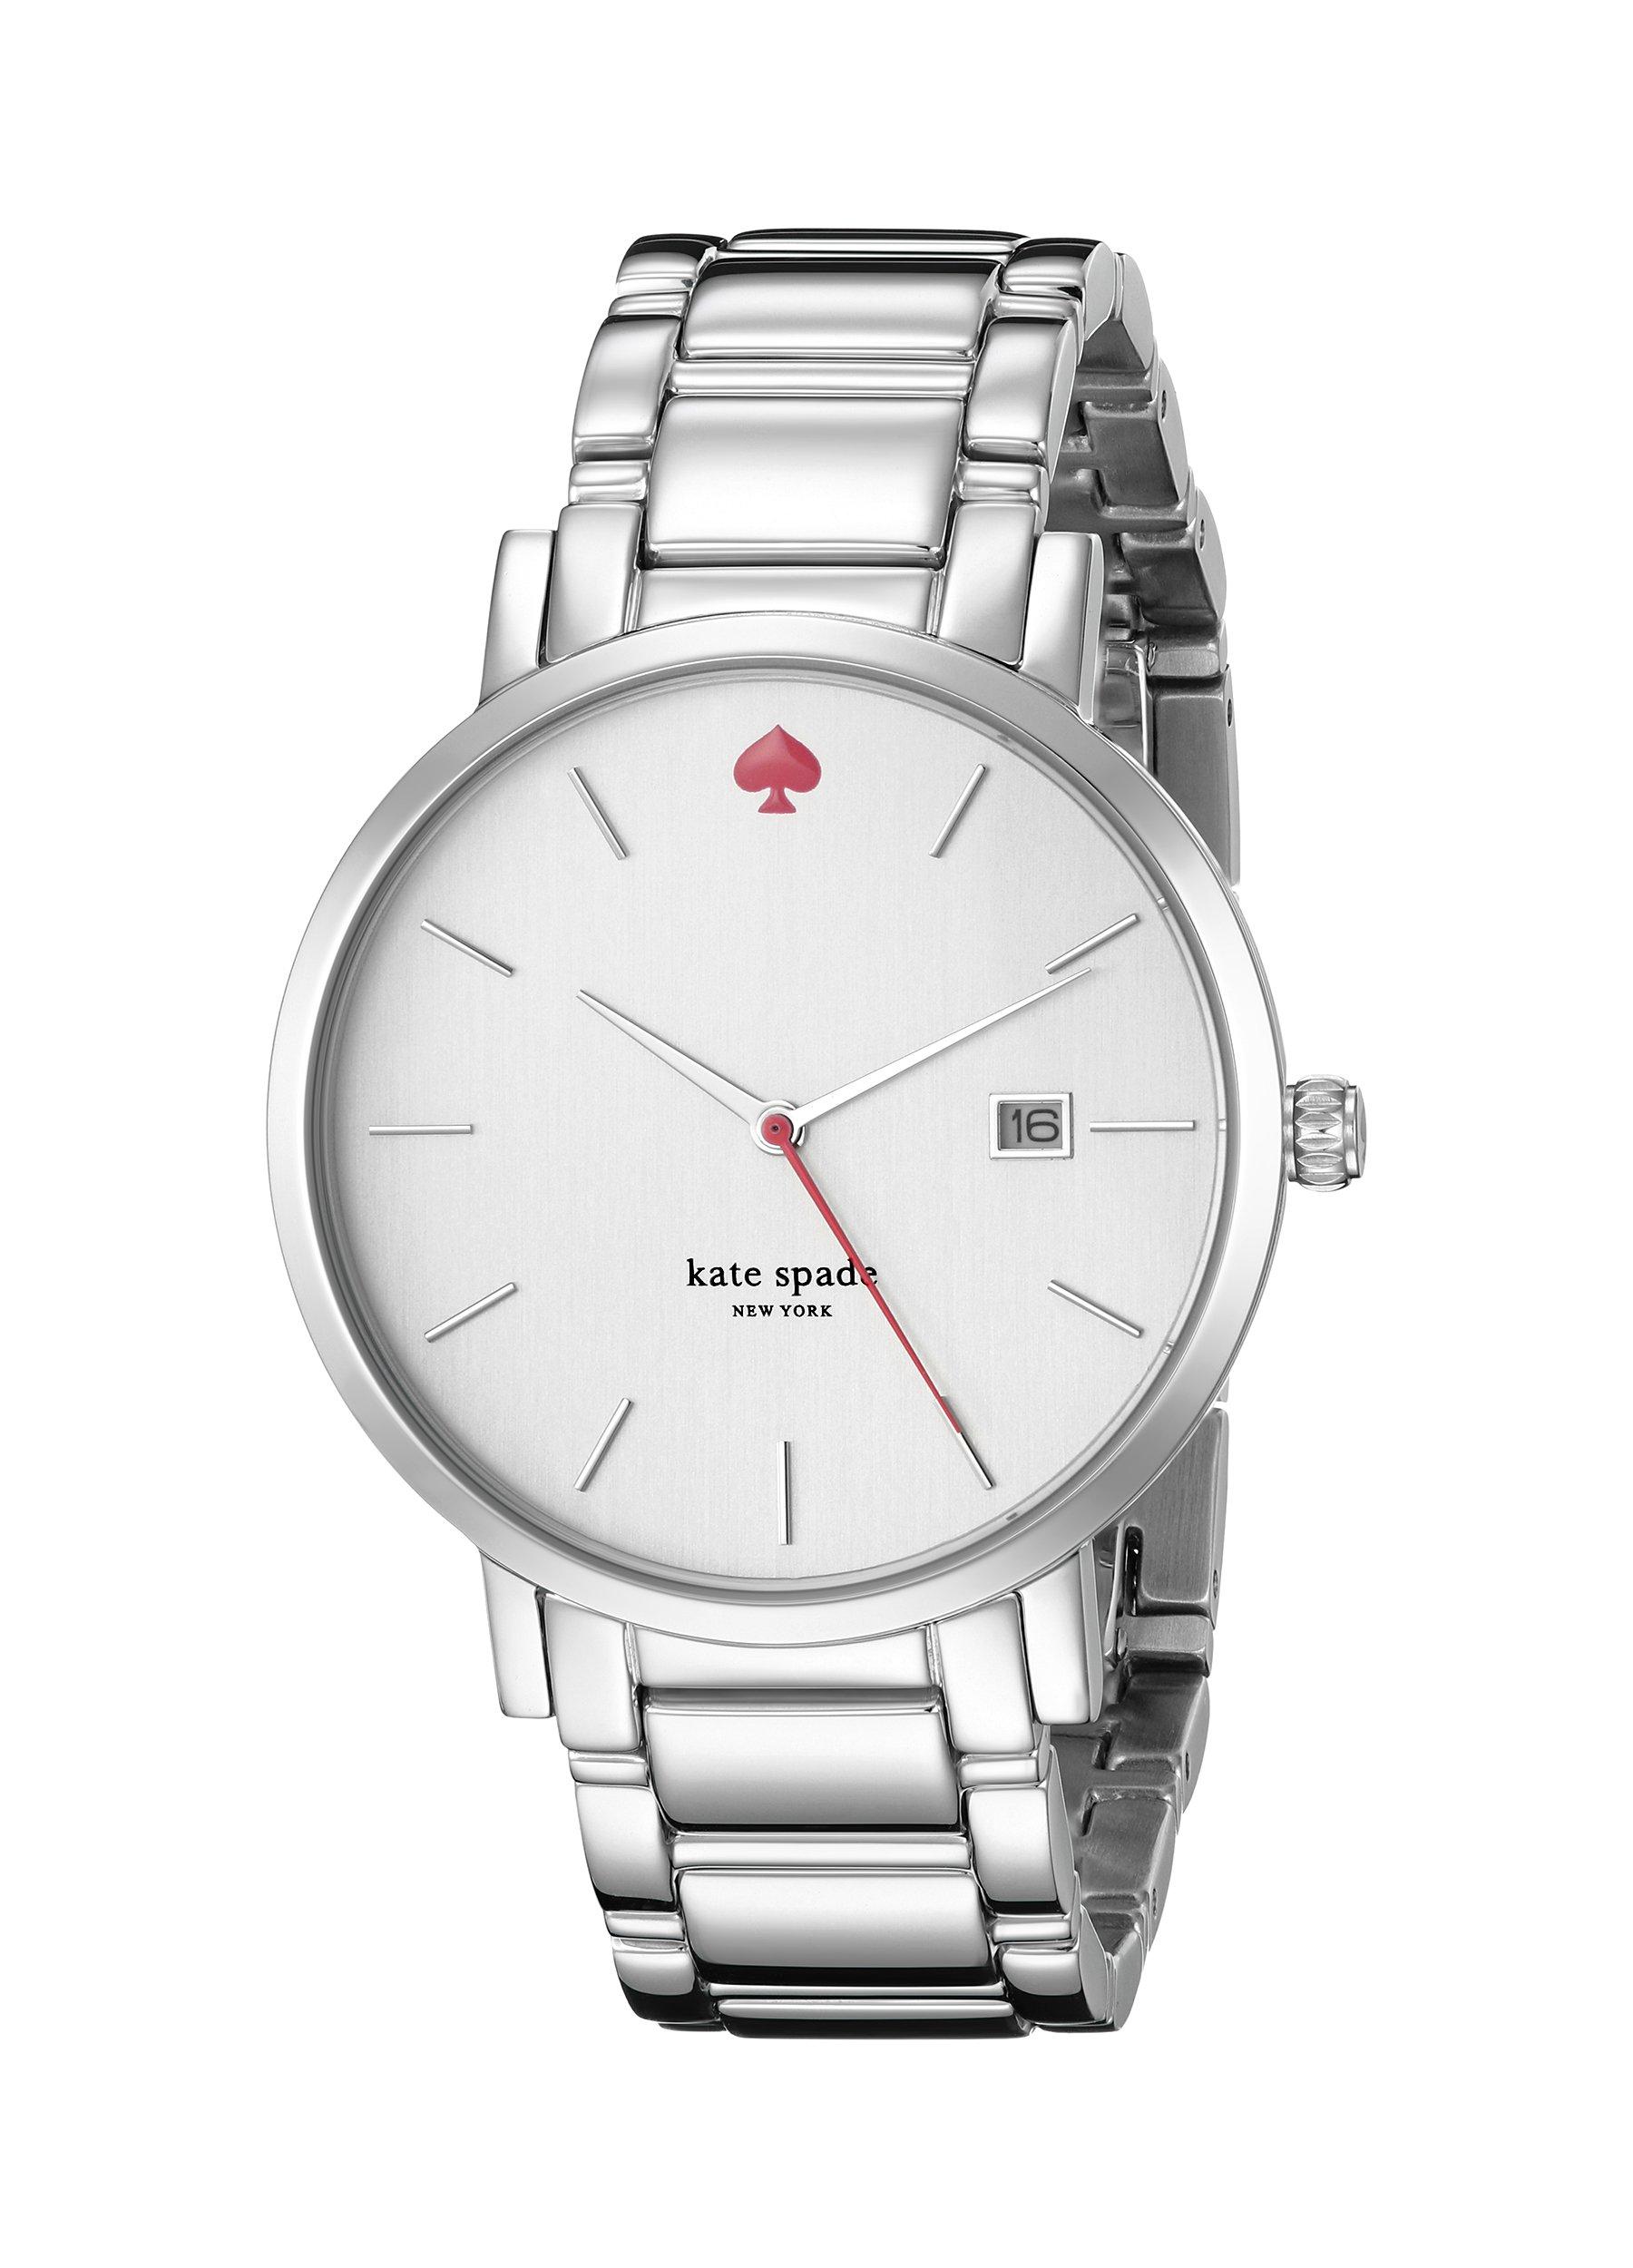 kate spade new york Women's 1YRU0008 ''Gramercy'' Stainless Steel Bracelet Watch